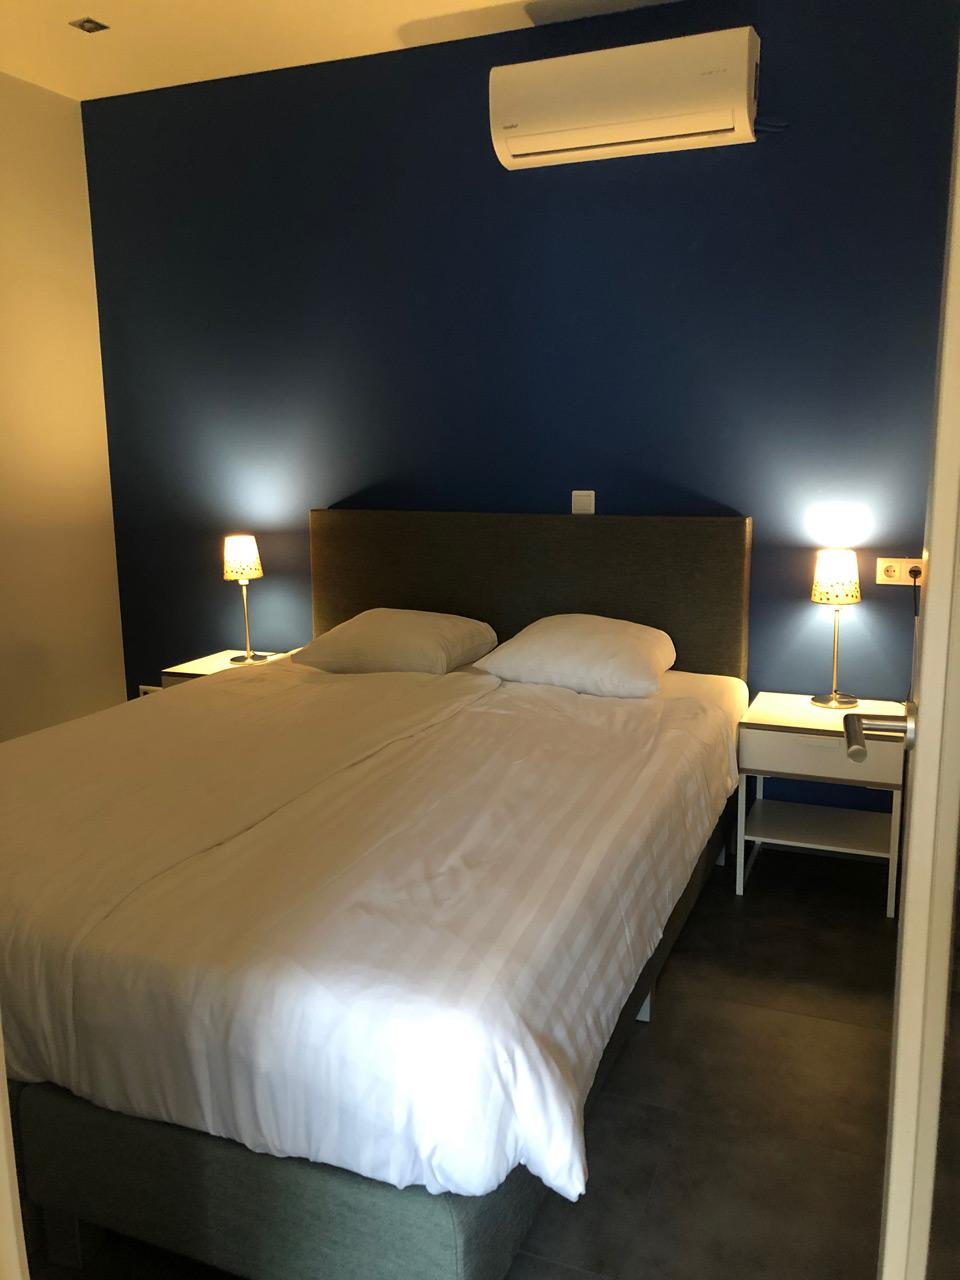 Slaapkamer-sleepingroom-schlafzimmer-Droste-Relaxed-Apartments2